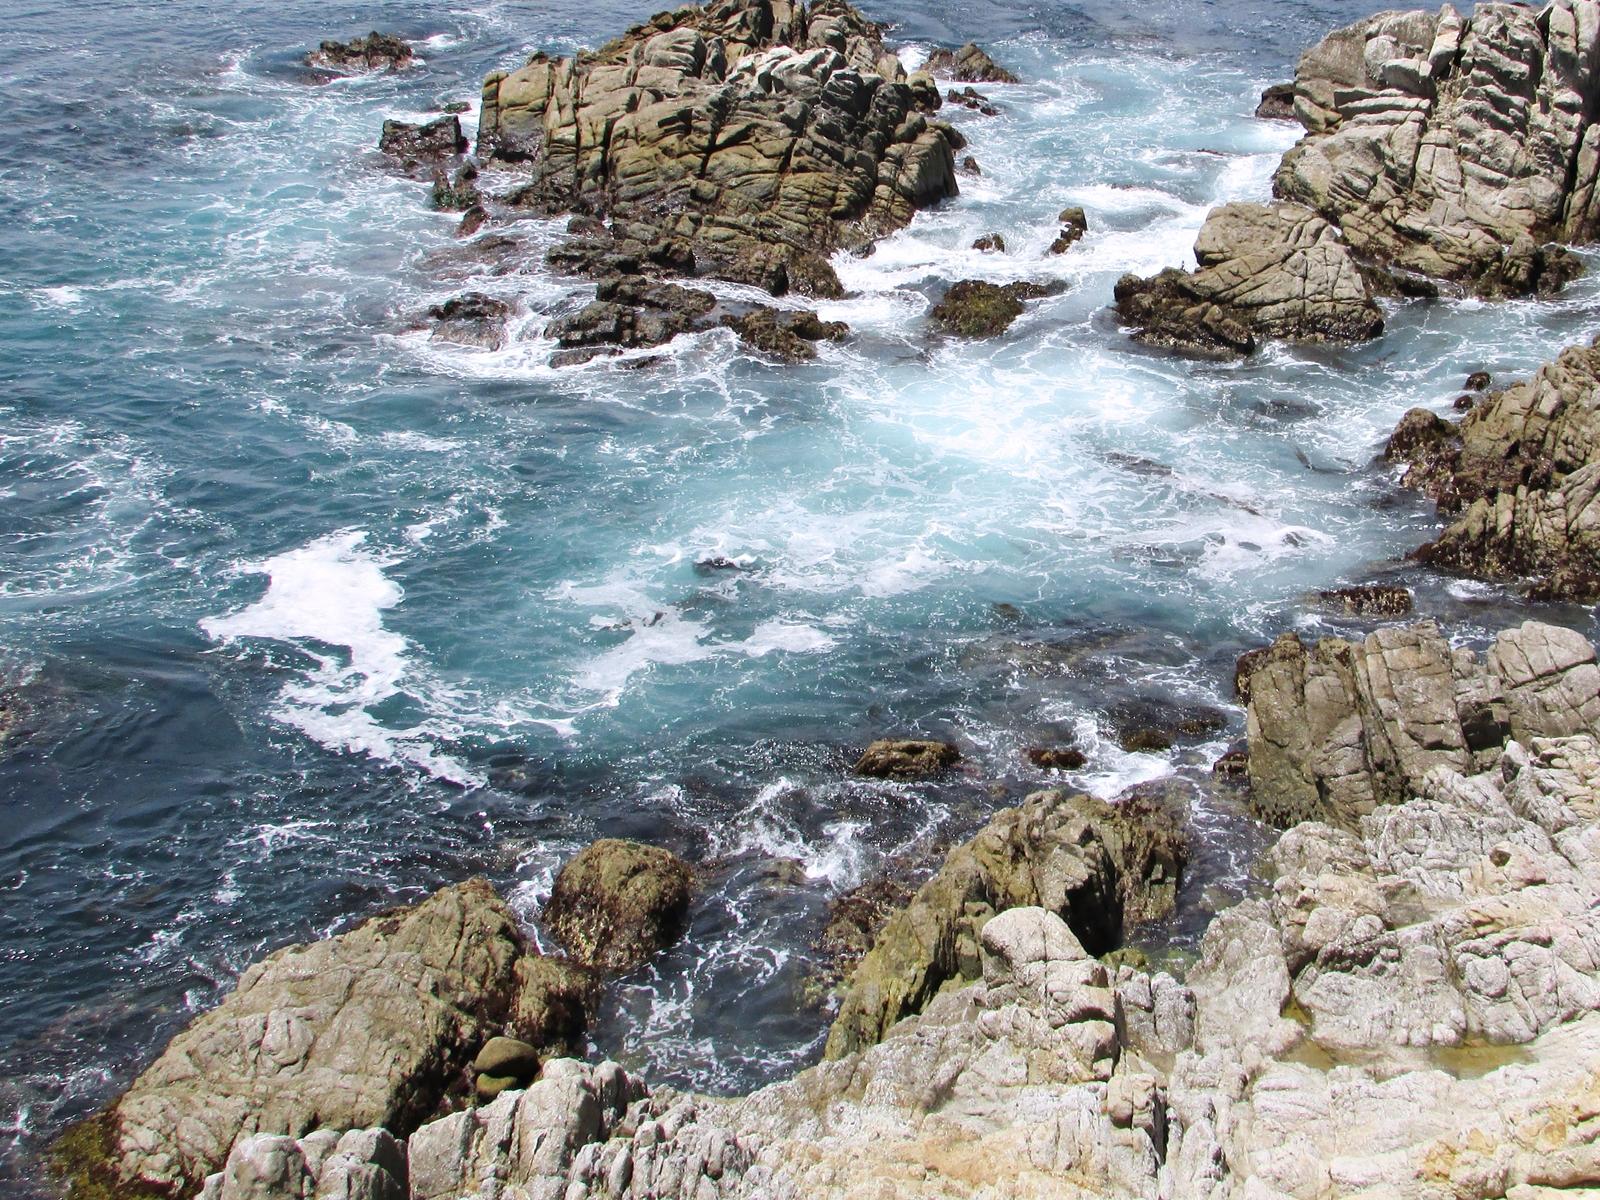 USA Rundreise - Amerika Westküste - Monterey - 17-Mile Drive - Fashionladyloves - Travelblog - Reise Blog